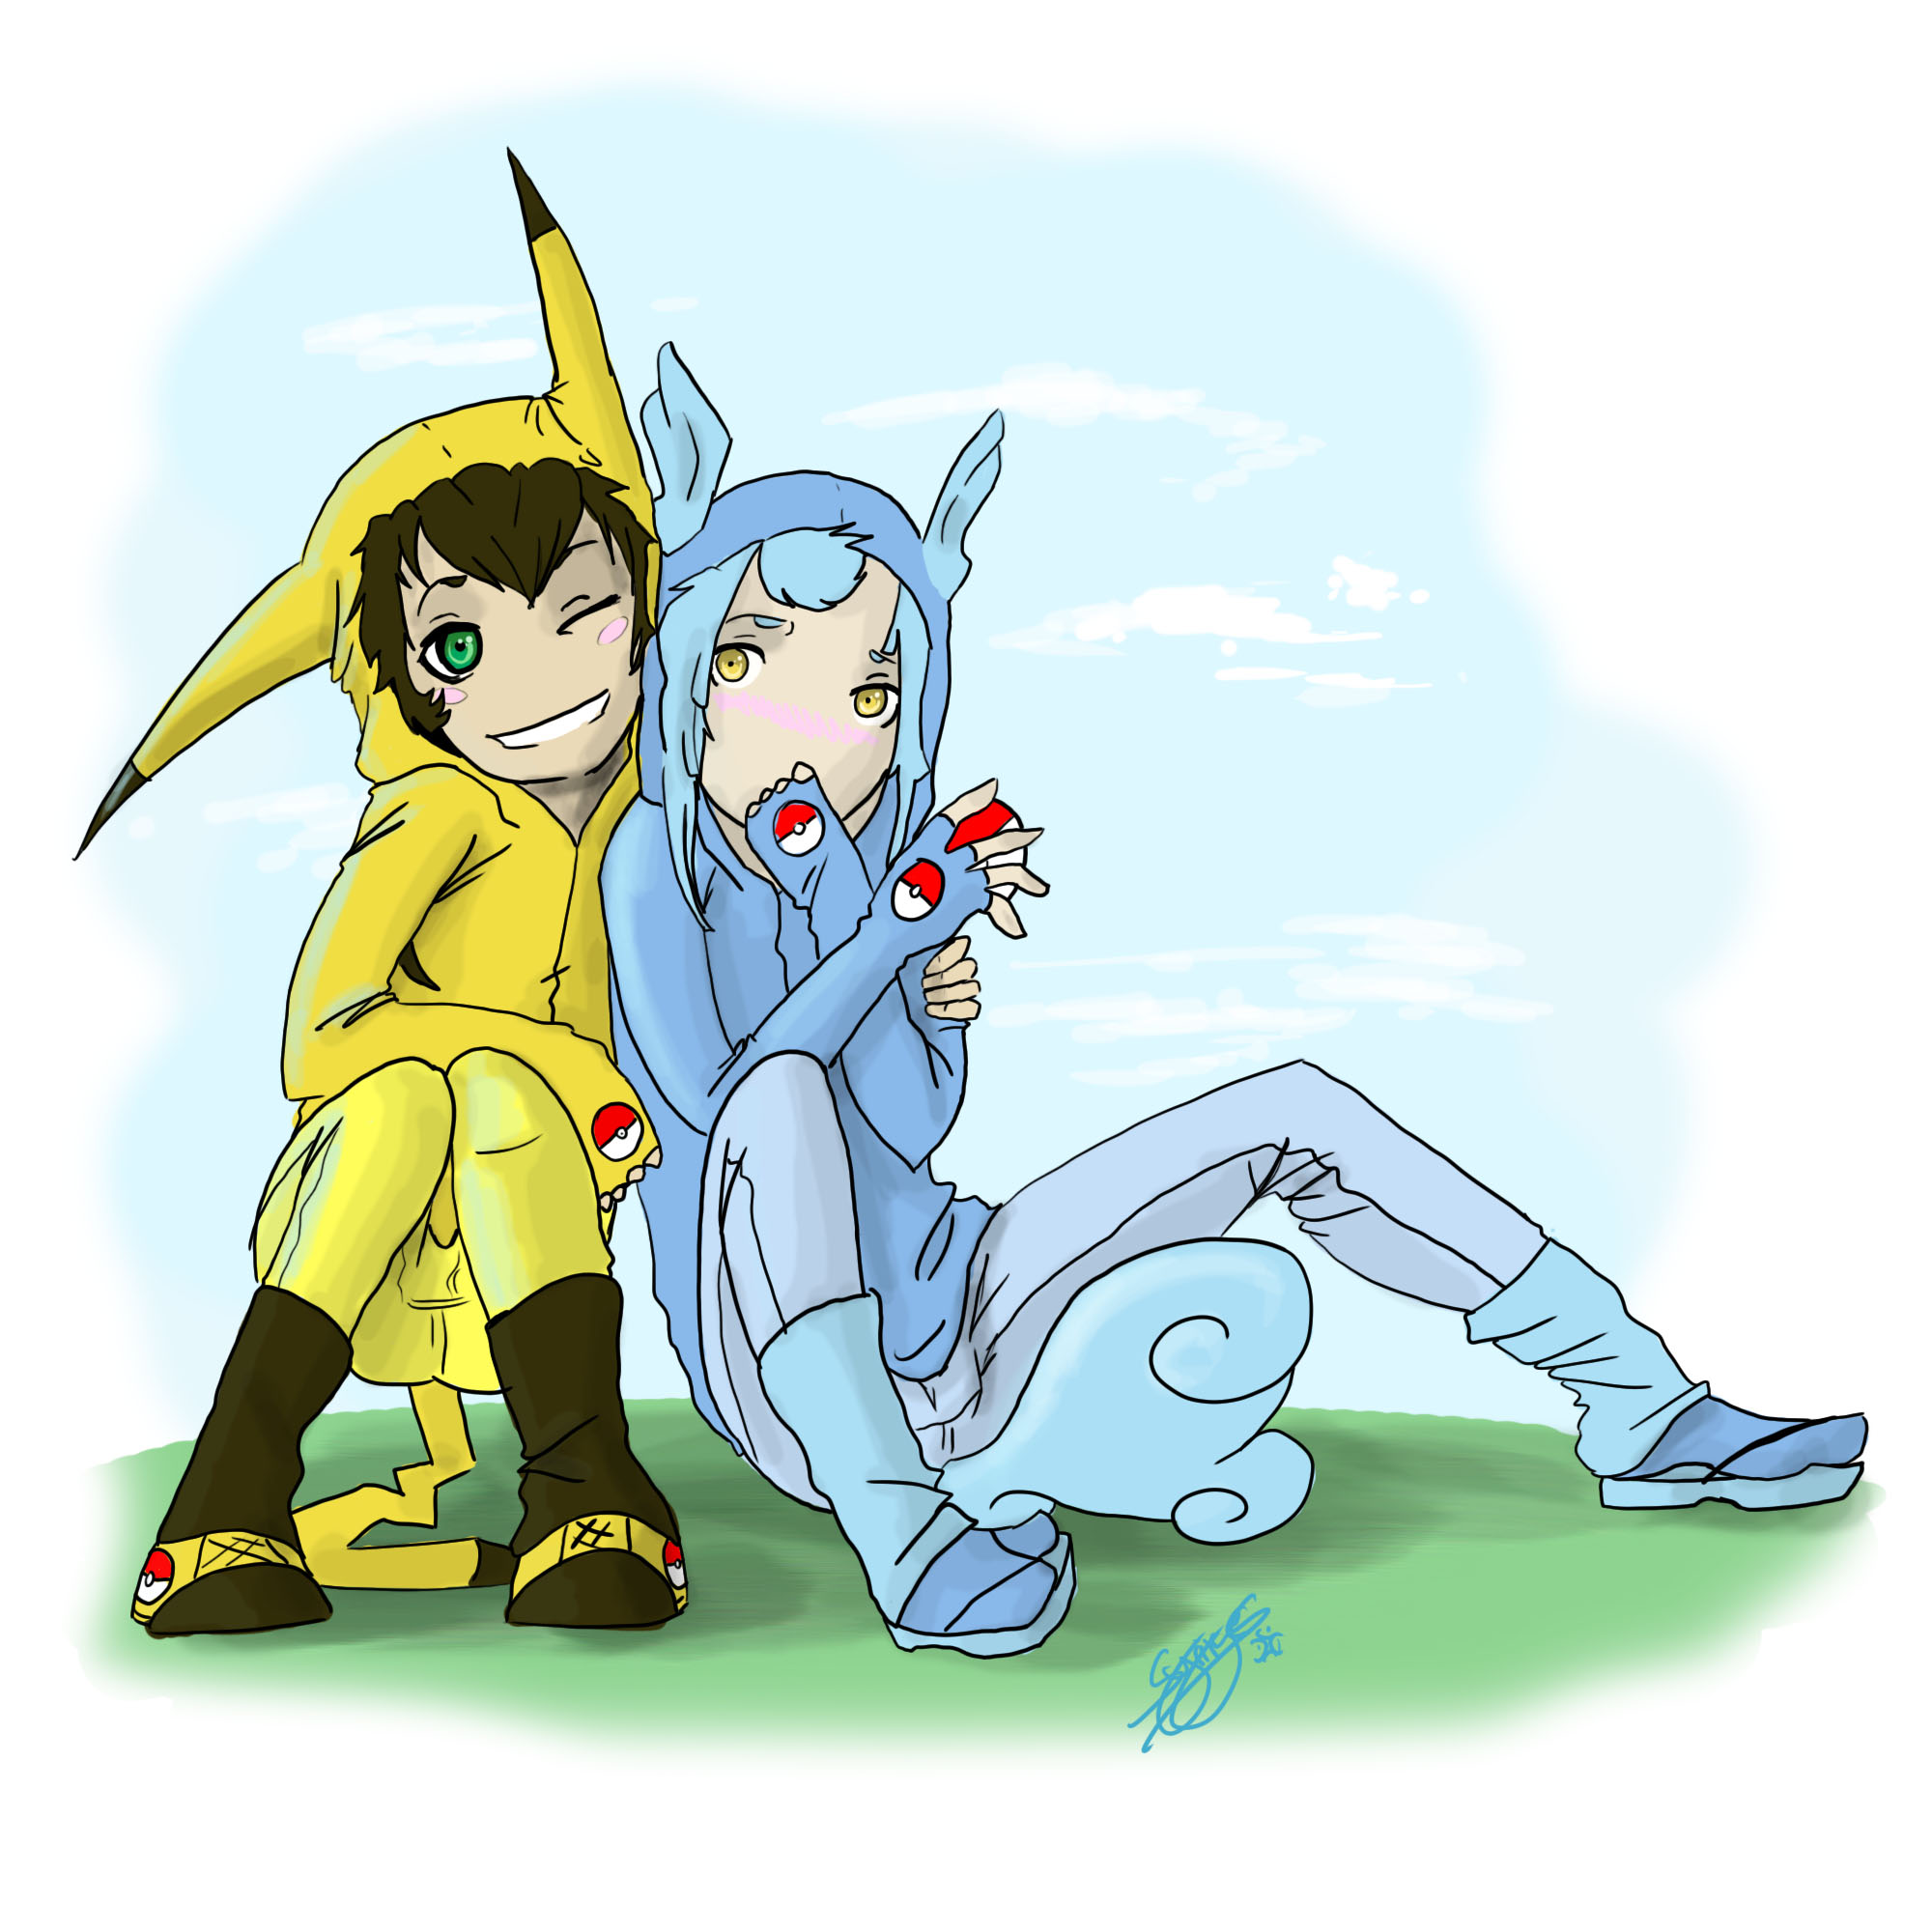 Pikachu and Wartortle